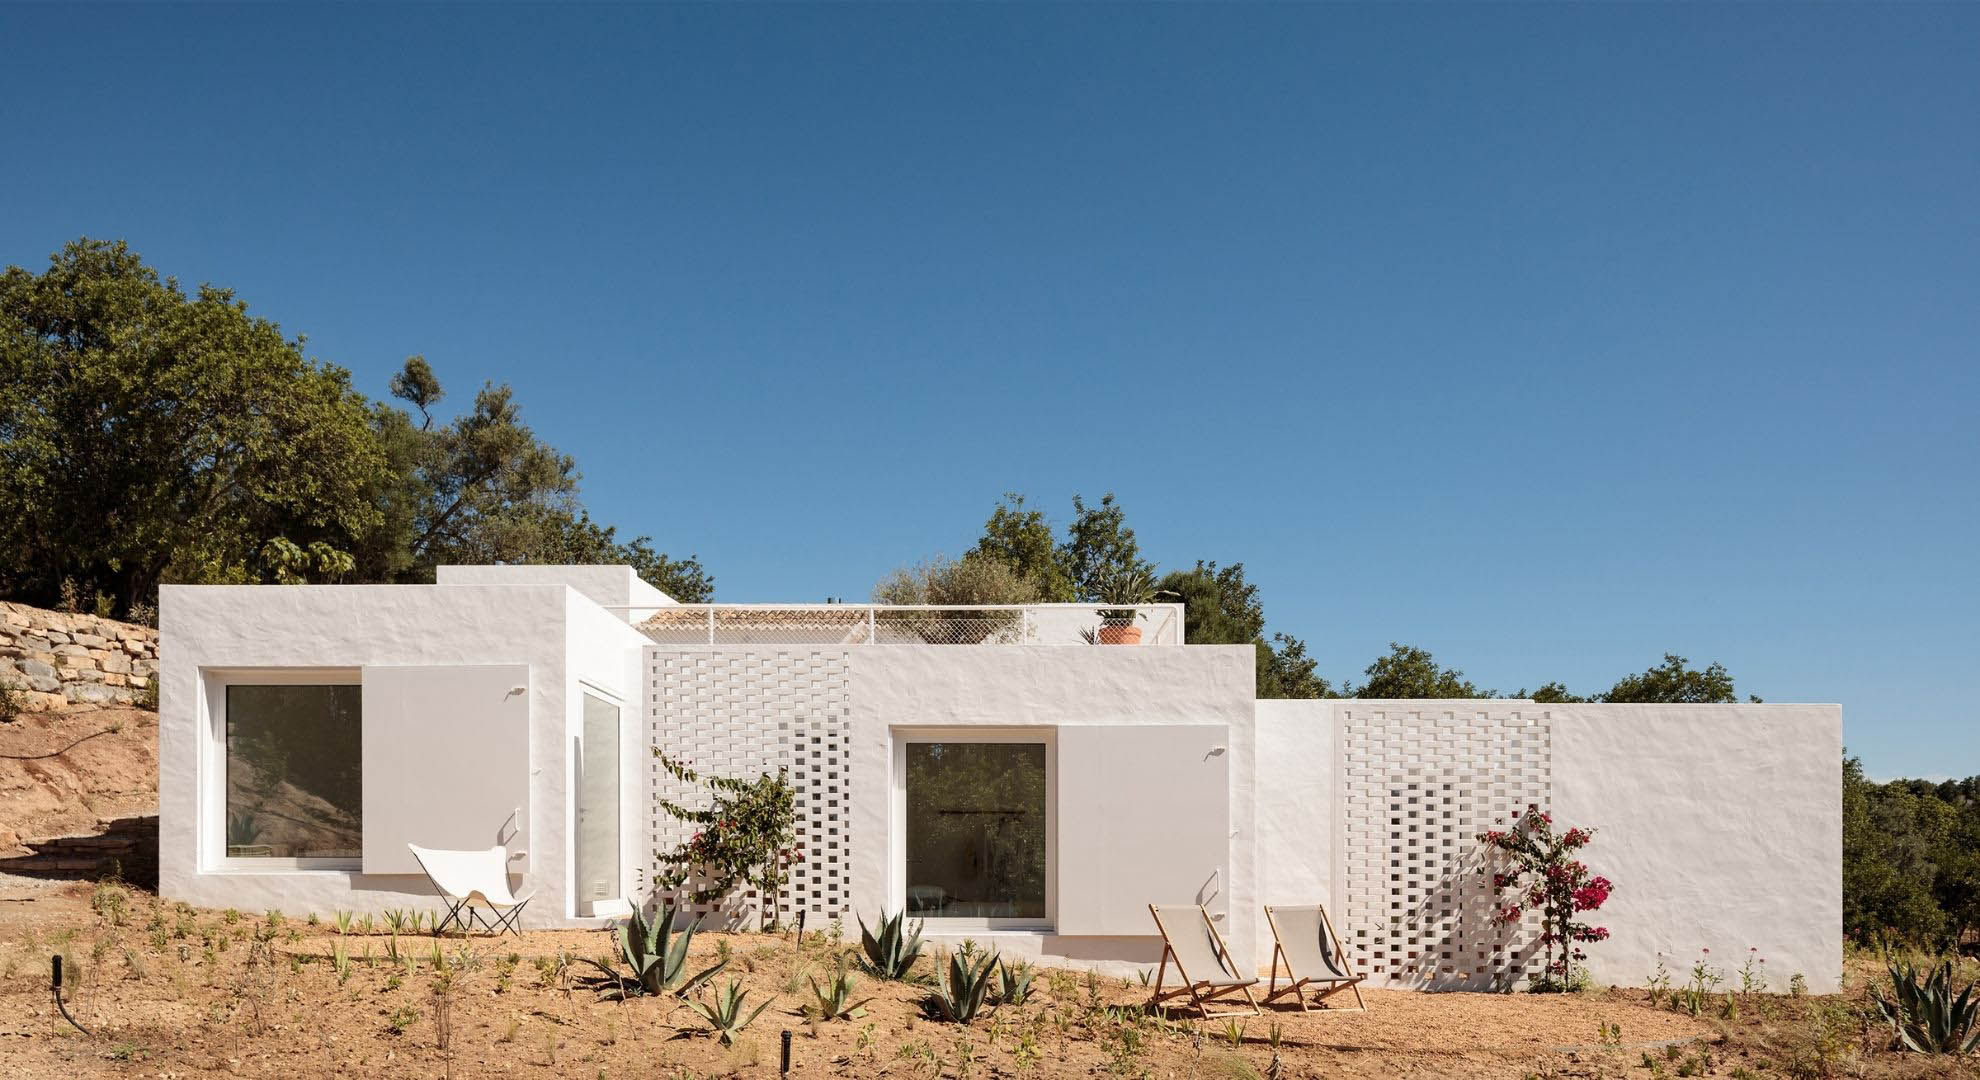 Casa Um is a reuse project by Atelier Rua.